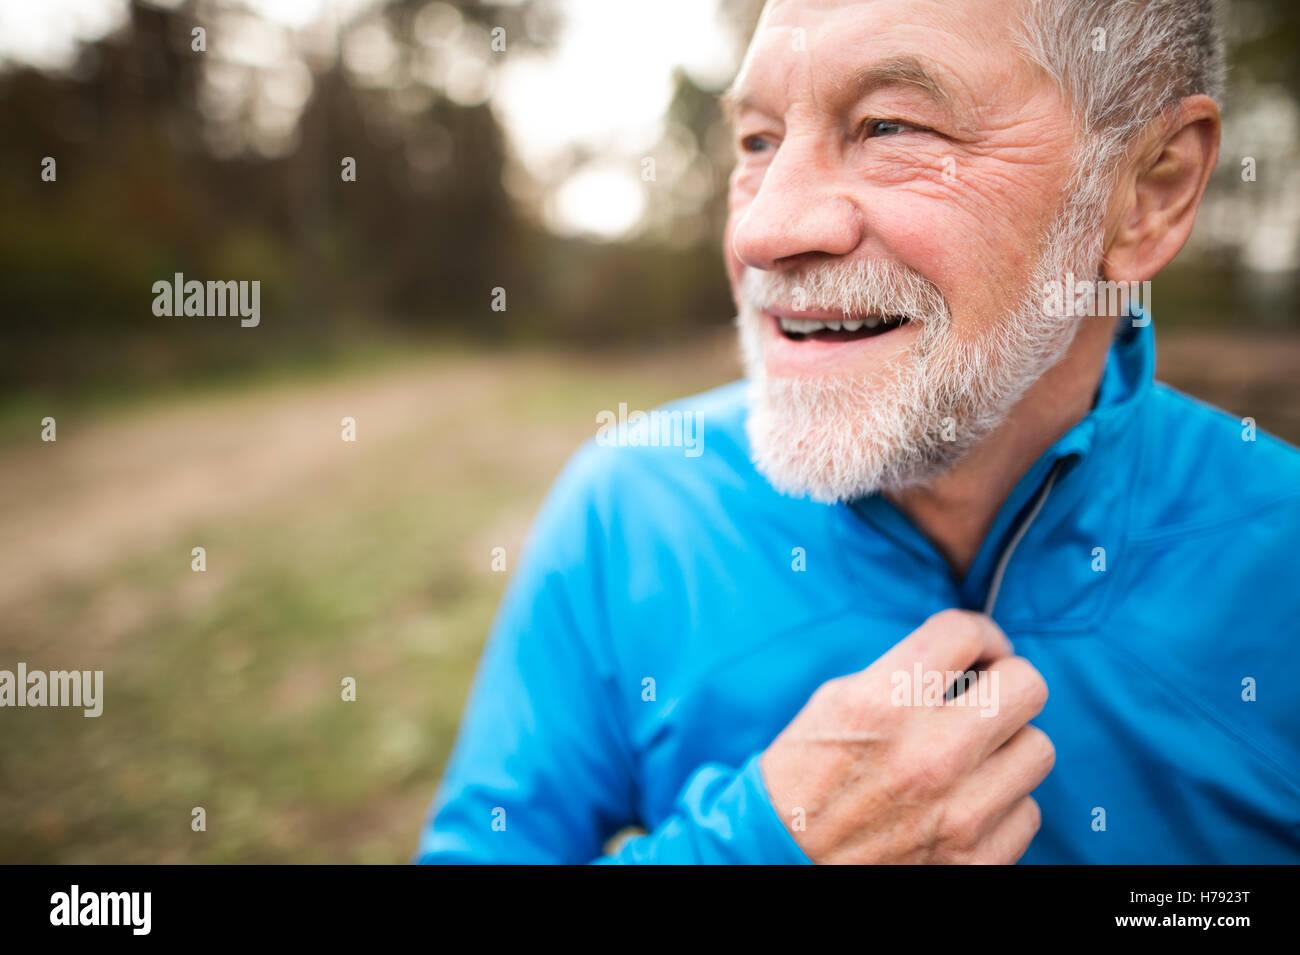 Senior runner in nature. Man resting, smiling. Close up. - Stock Image